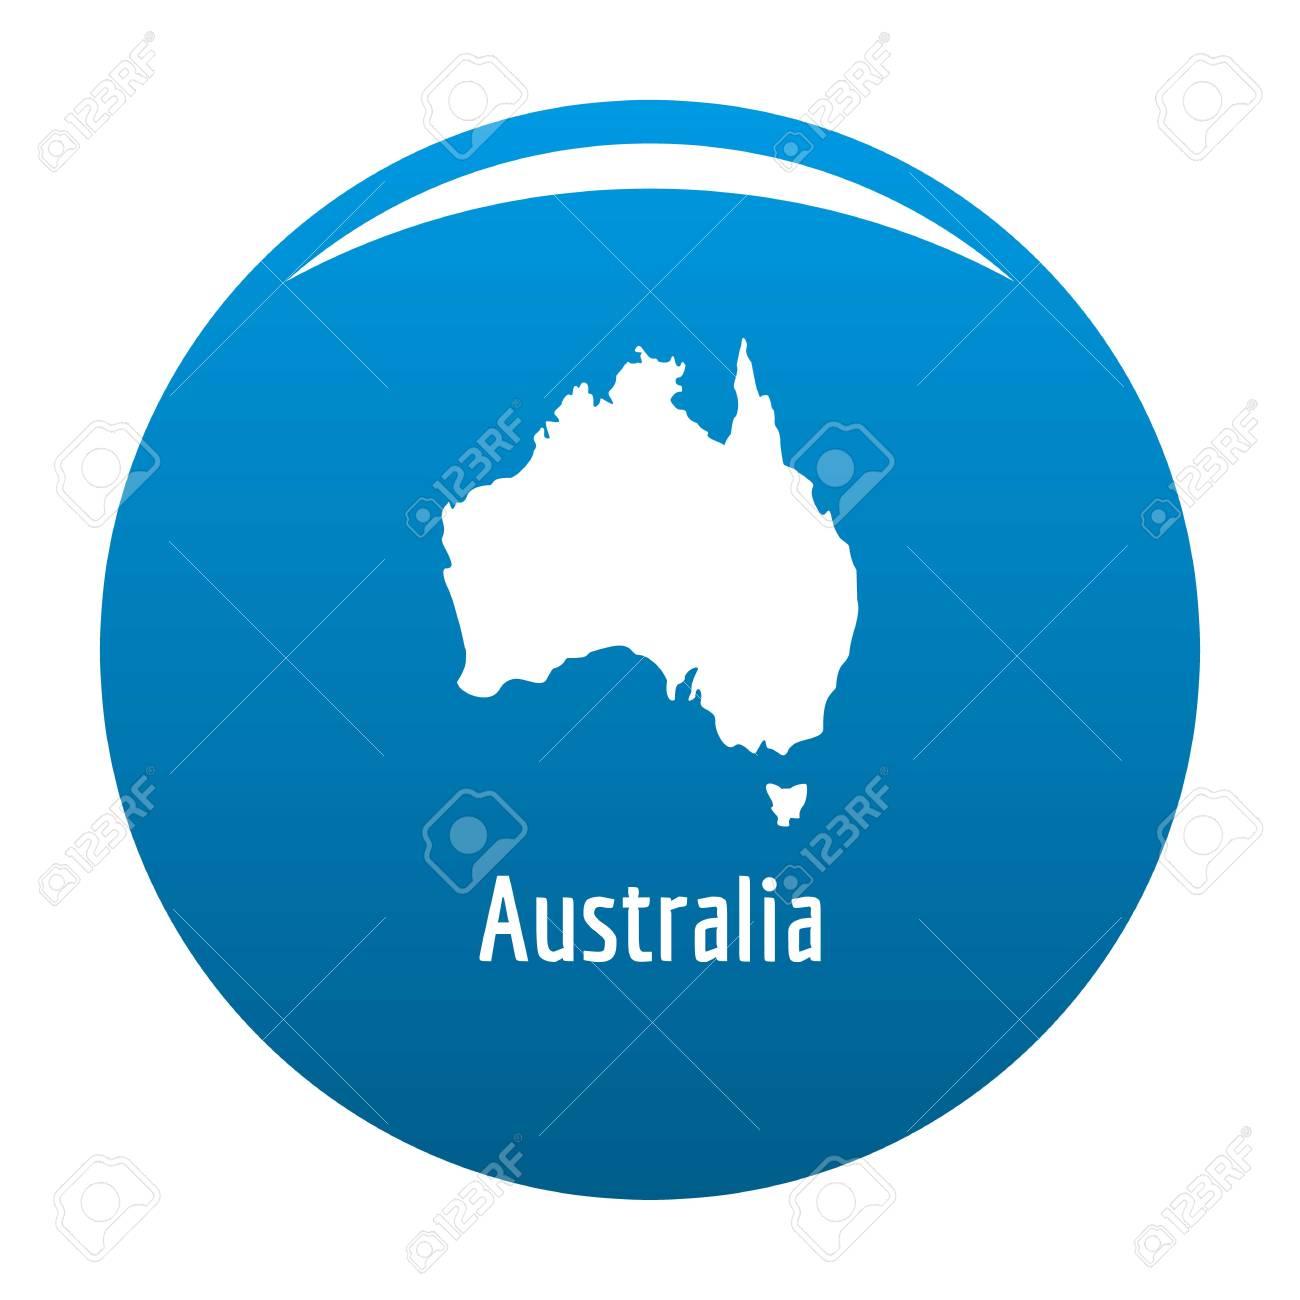 australia map in black simple illustration of australia map vector isolated on white background stock